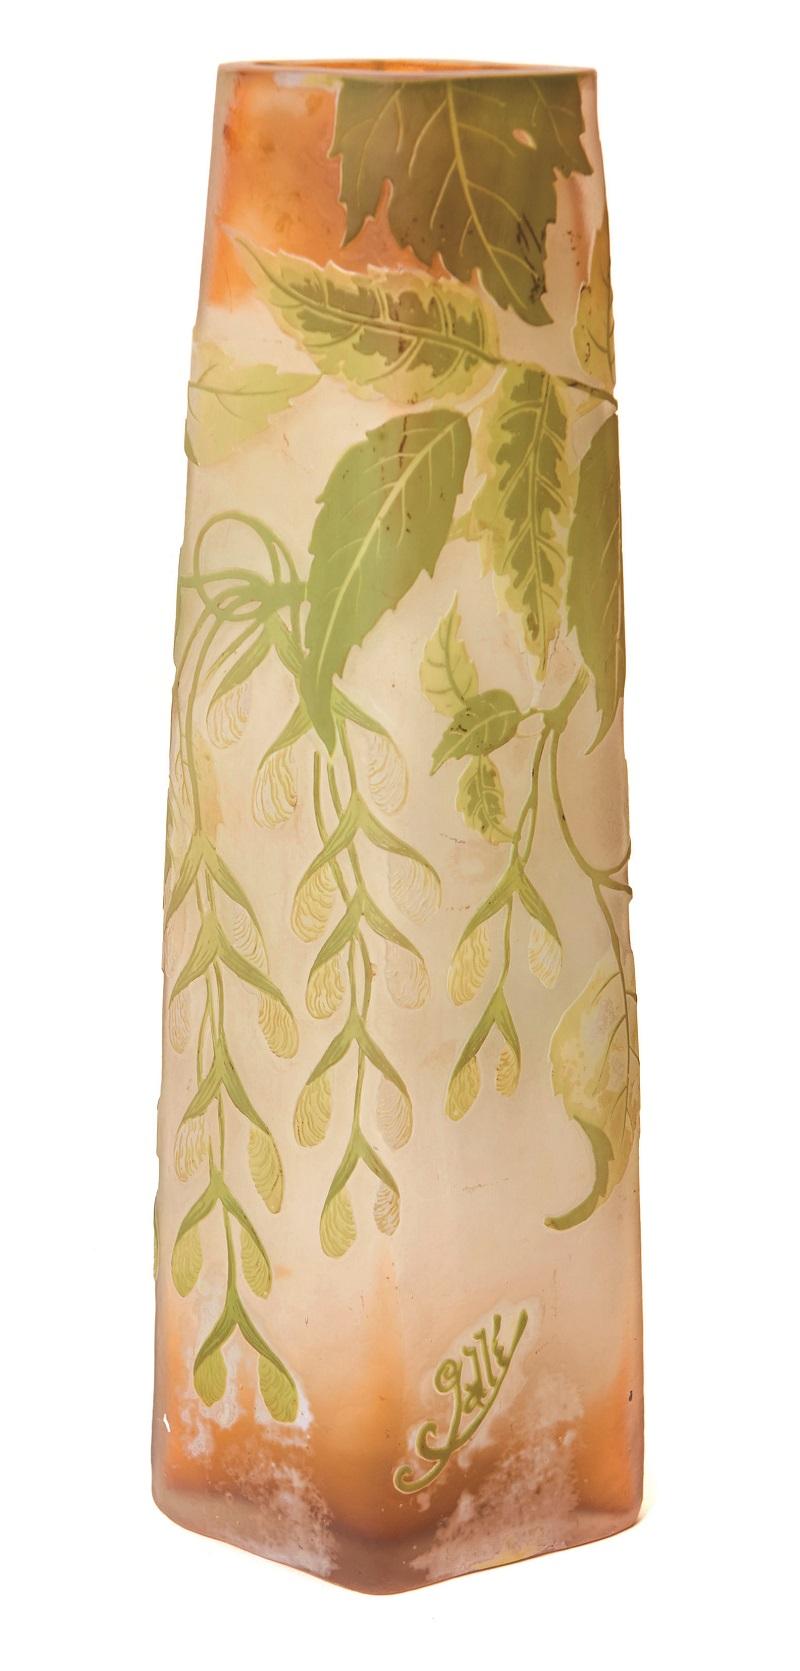 ÉMILE GALLÉ. Jarrón con glicinias Art Nouveau en vidrio polícromo grabado en camafeo. Firmado. Altura: 38 cm. (S. XX)